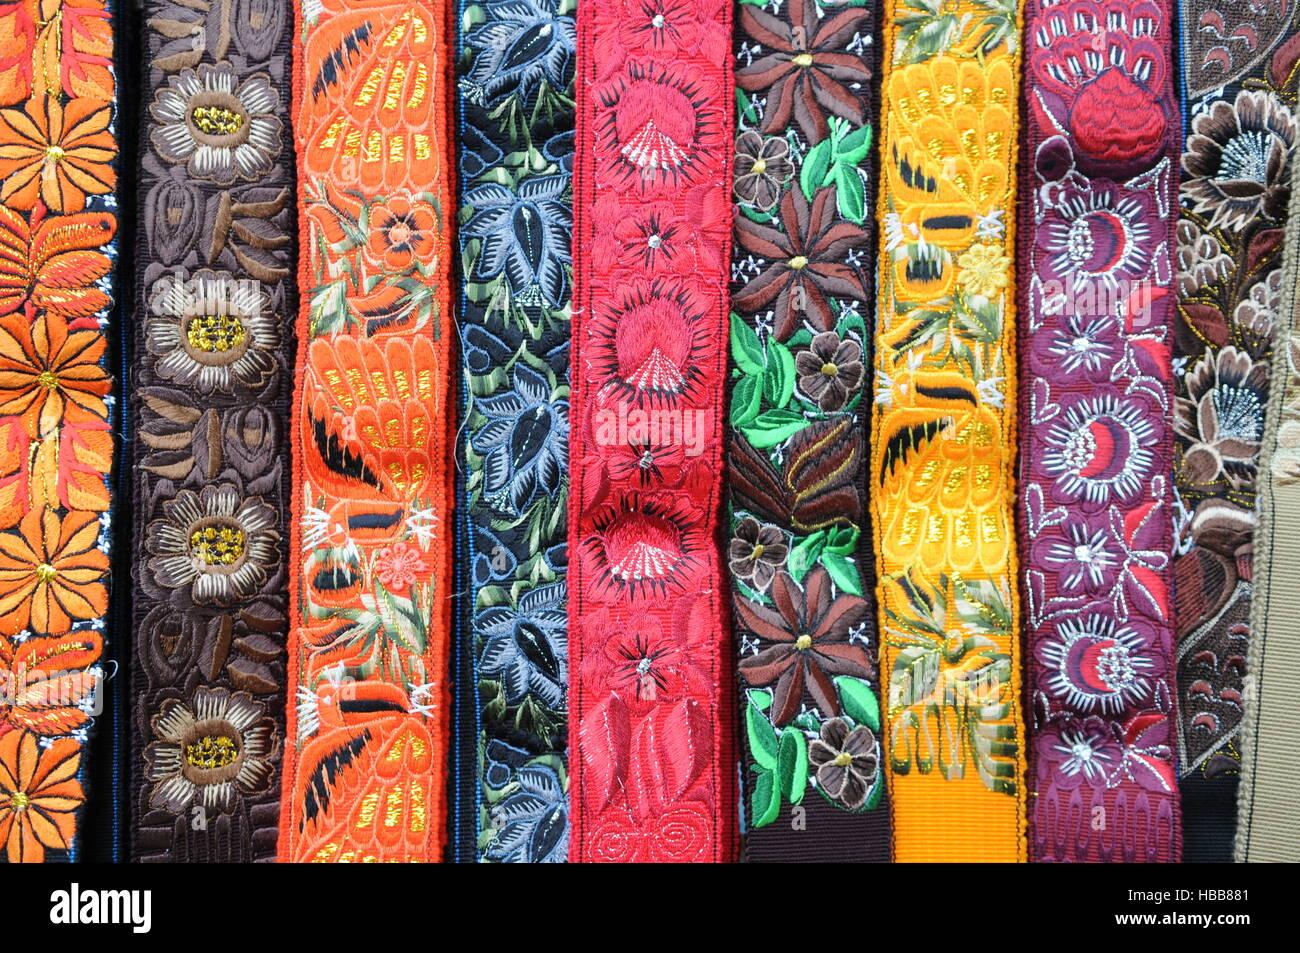 Colorful Mayan textiles, Nahuala, Solola, Guatemala. credit: Kraig Lieb - Stock Image